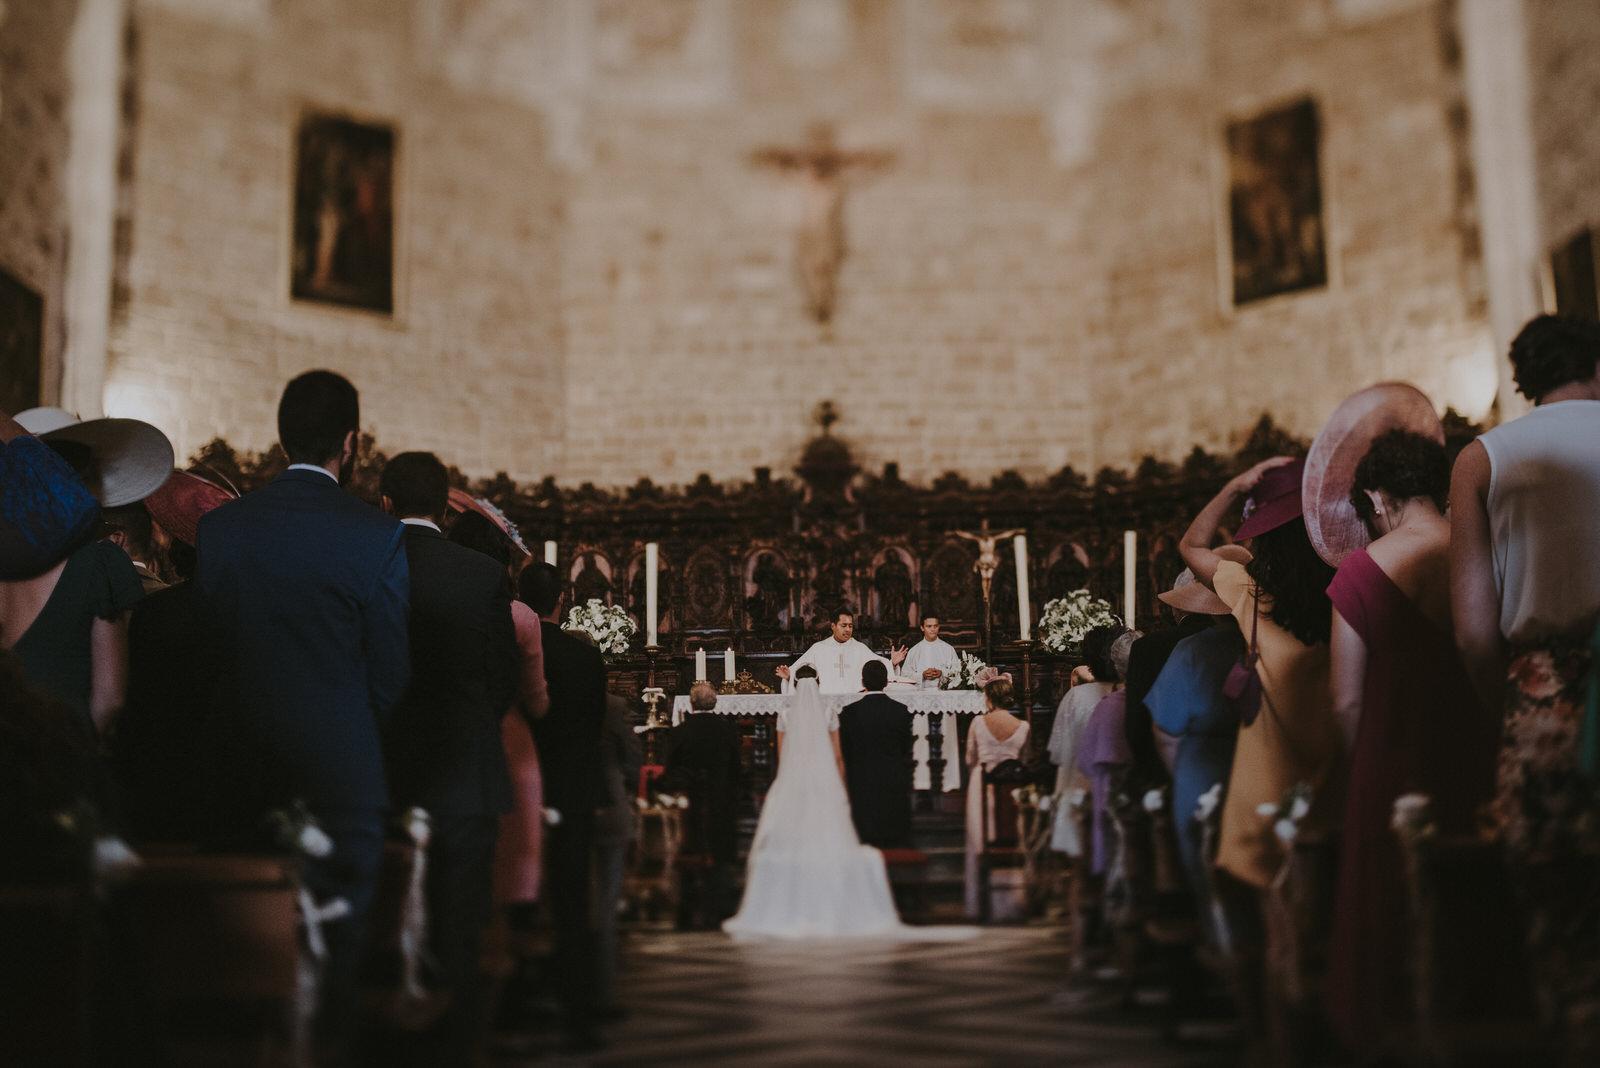 Boda en Rota - Fotografo de boda Andres Amarillo - cadiz - nikon 45mm 2.8e .jpg